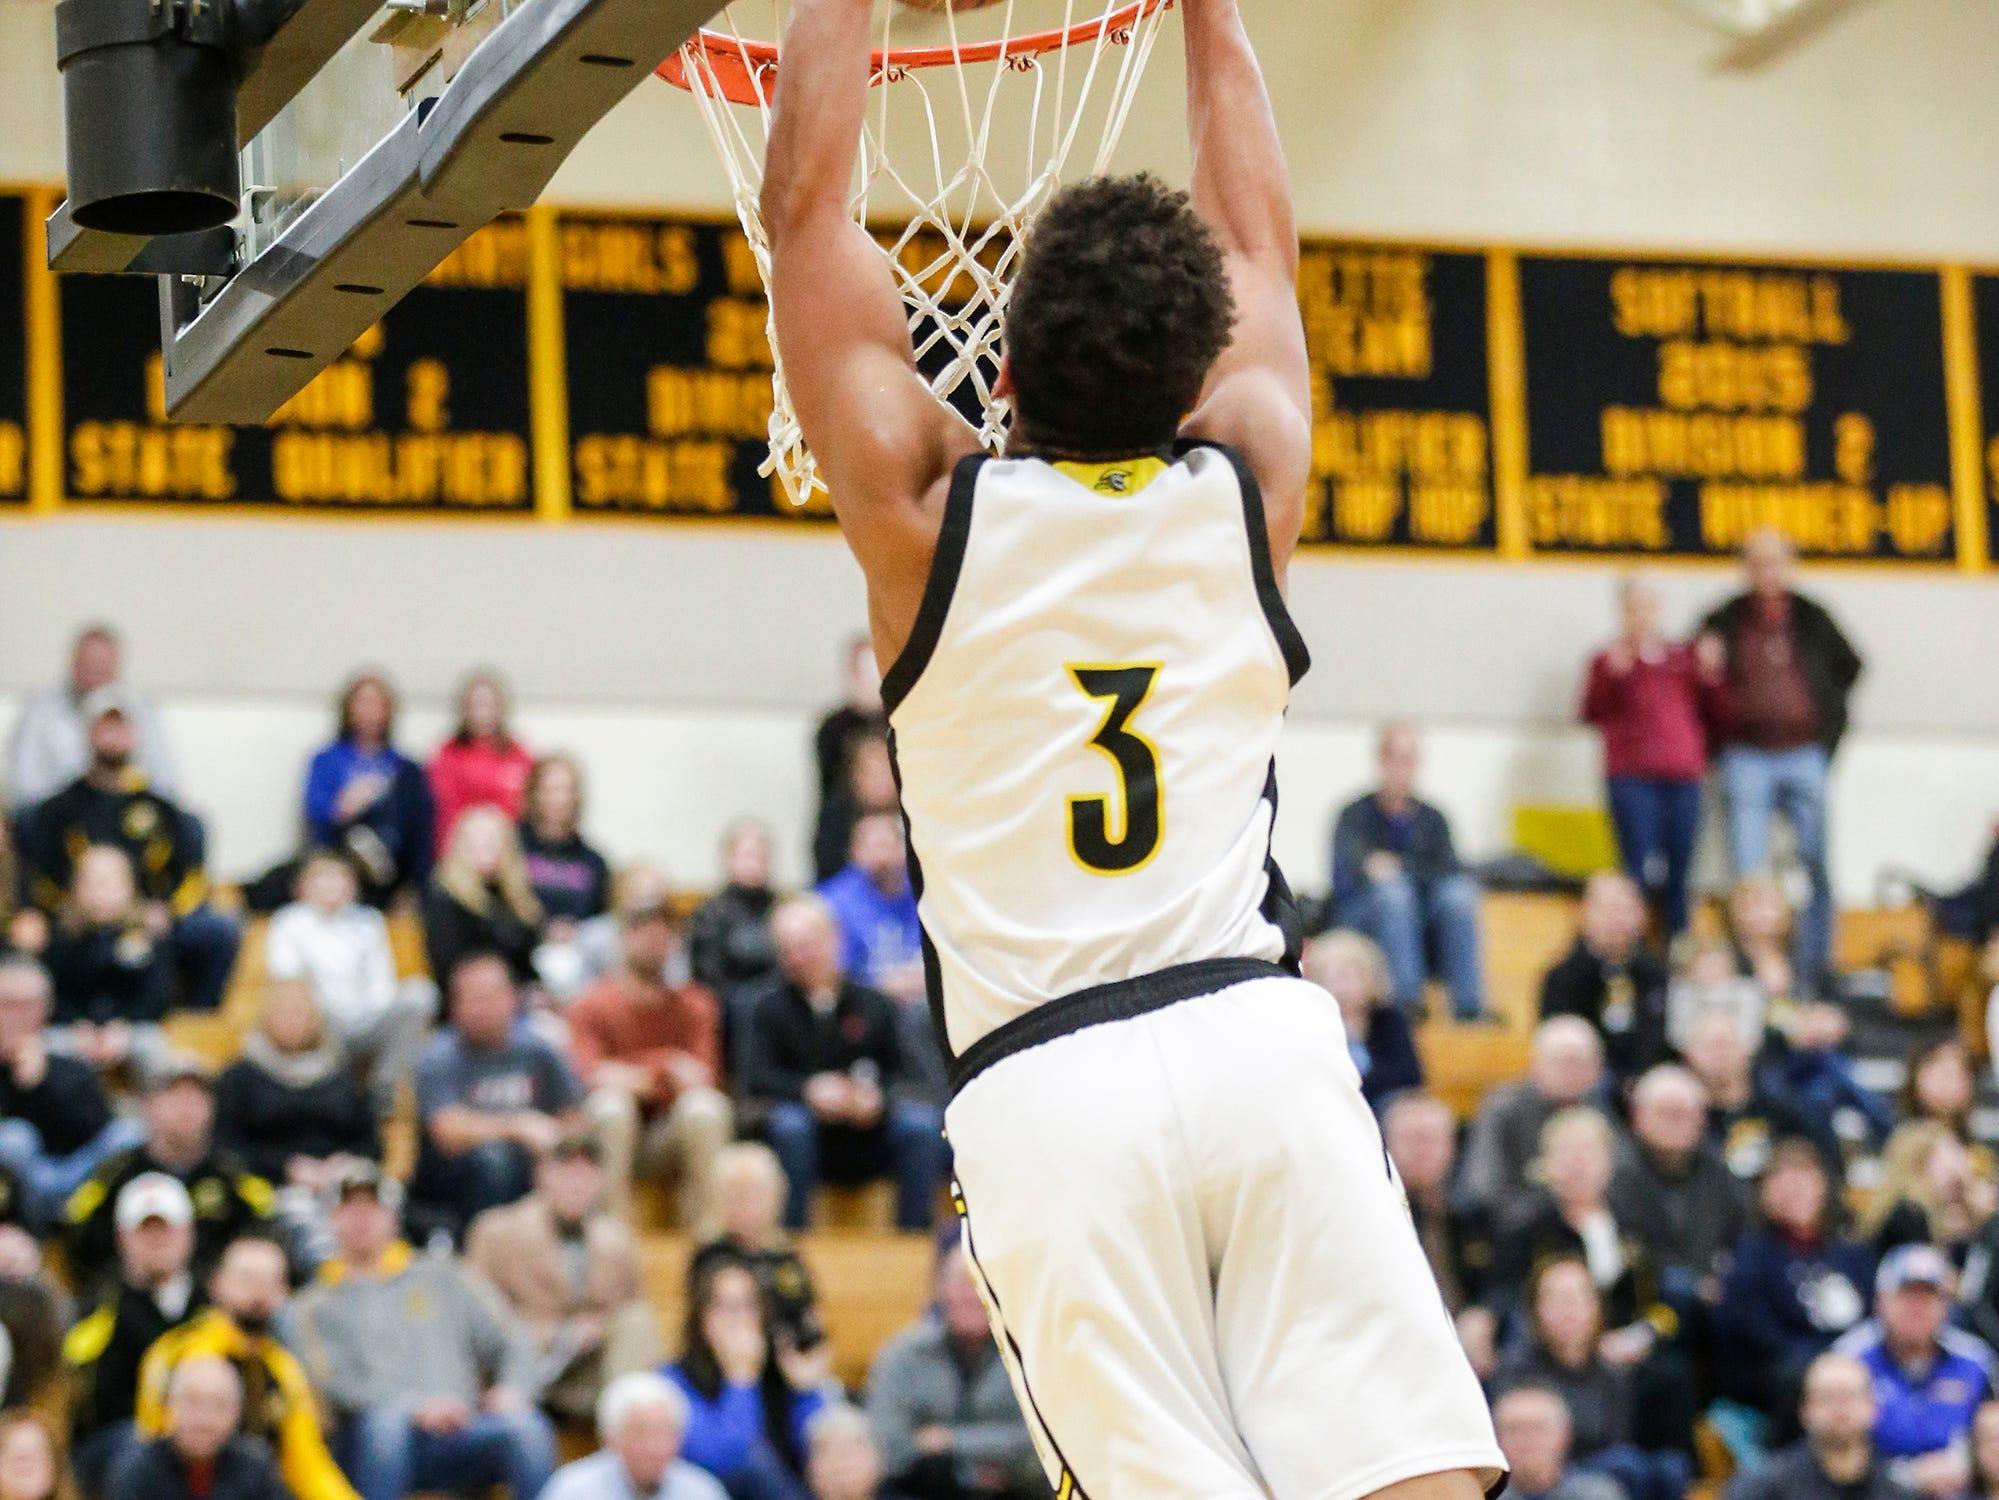 Waupun High School boys basketball's Quintin Winterfeldt dunks the ball against Campbellsport High School during their game Friday, December 14, 2018 in Waupun. Waupun won the game 64-33. Doug Raflik/USA TODAY NETWORK-Wisconsin